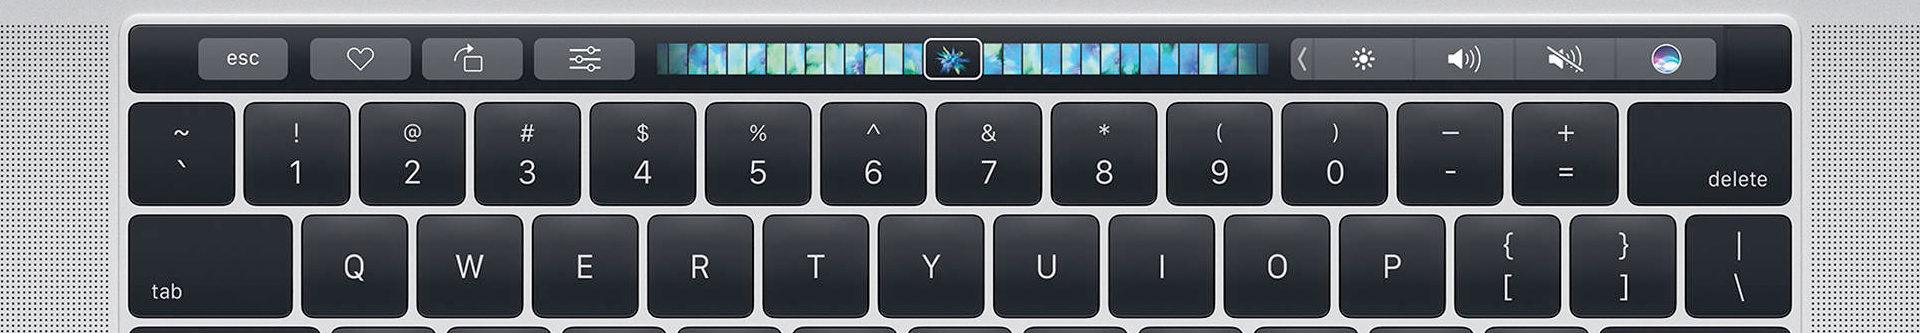 apple macbook pro 2016 15.4 inch touch bar.jpg